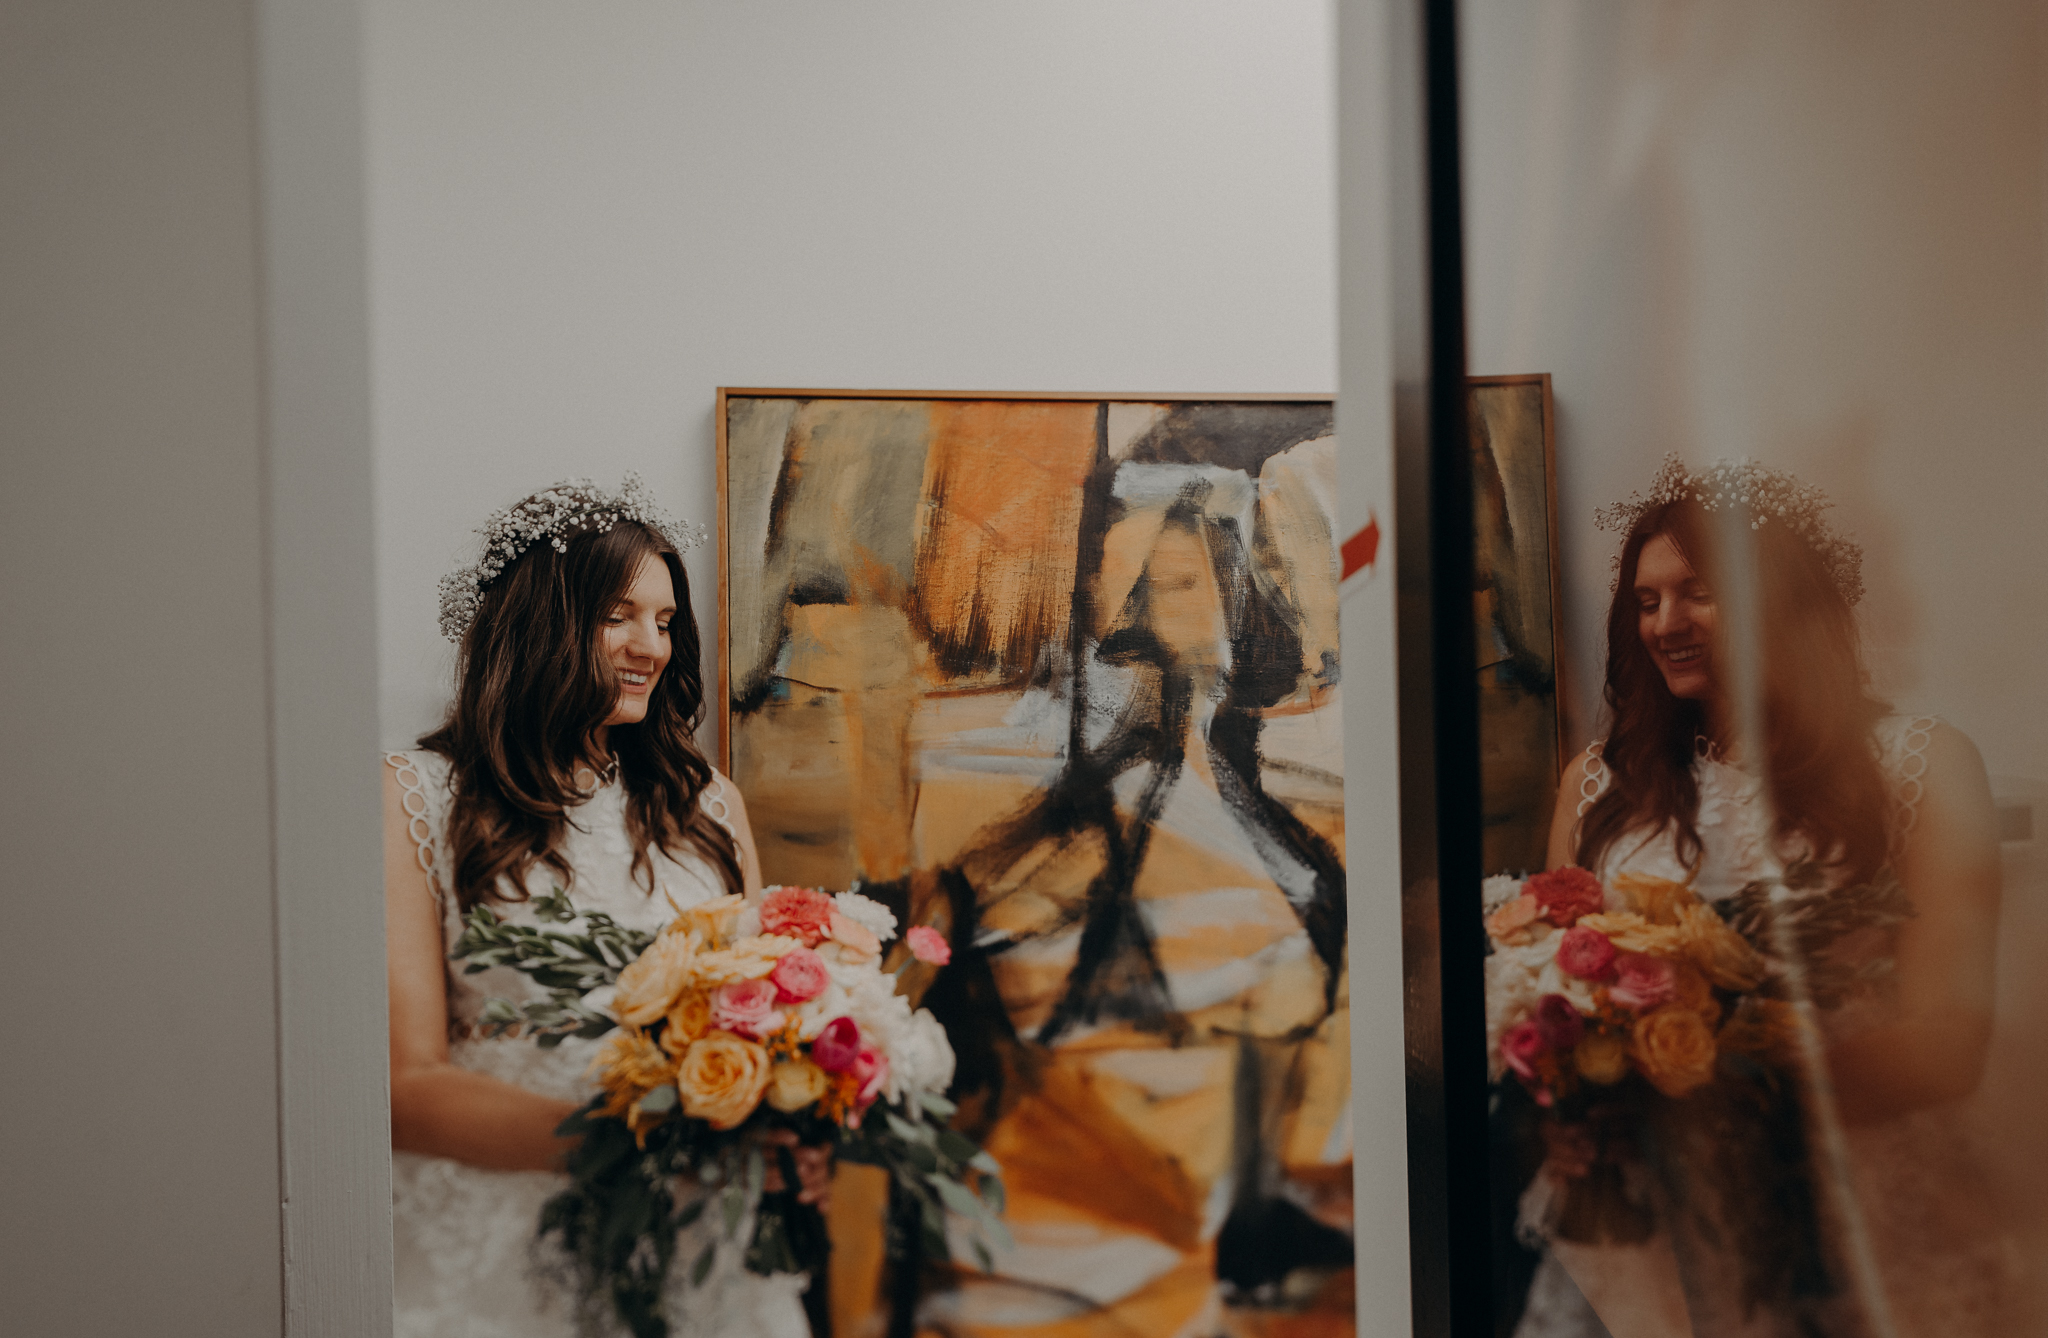 Isaiah + Taylor Photography - Private Estate Backyard Wedding - Beverly Hills - Los Angeles Wedding Photographer - 05.jpg